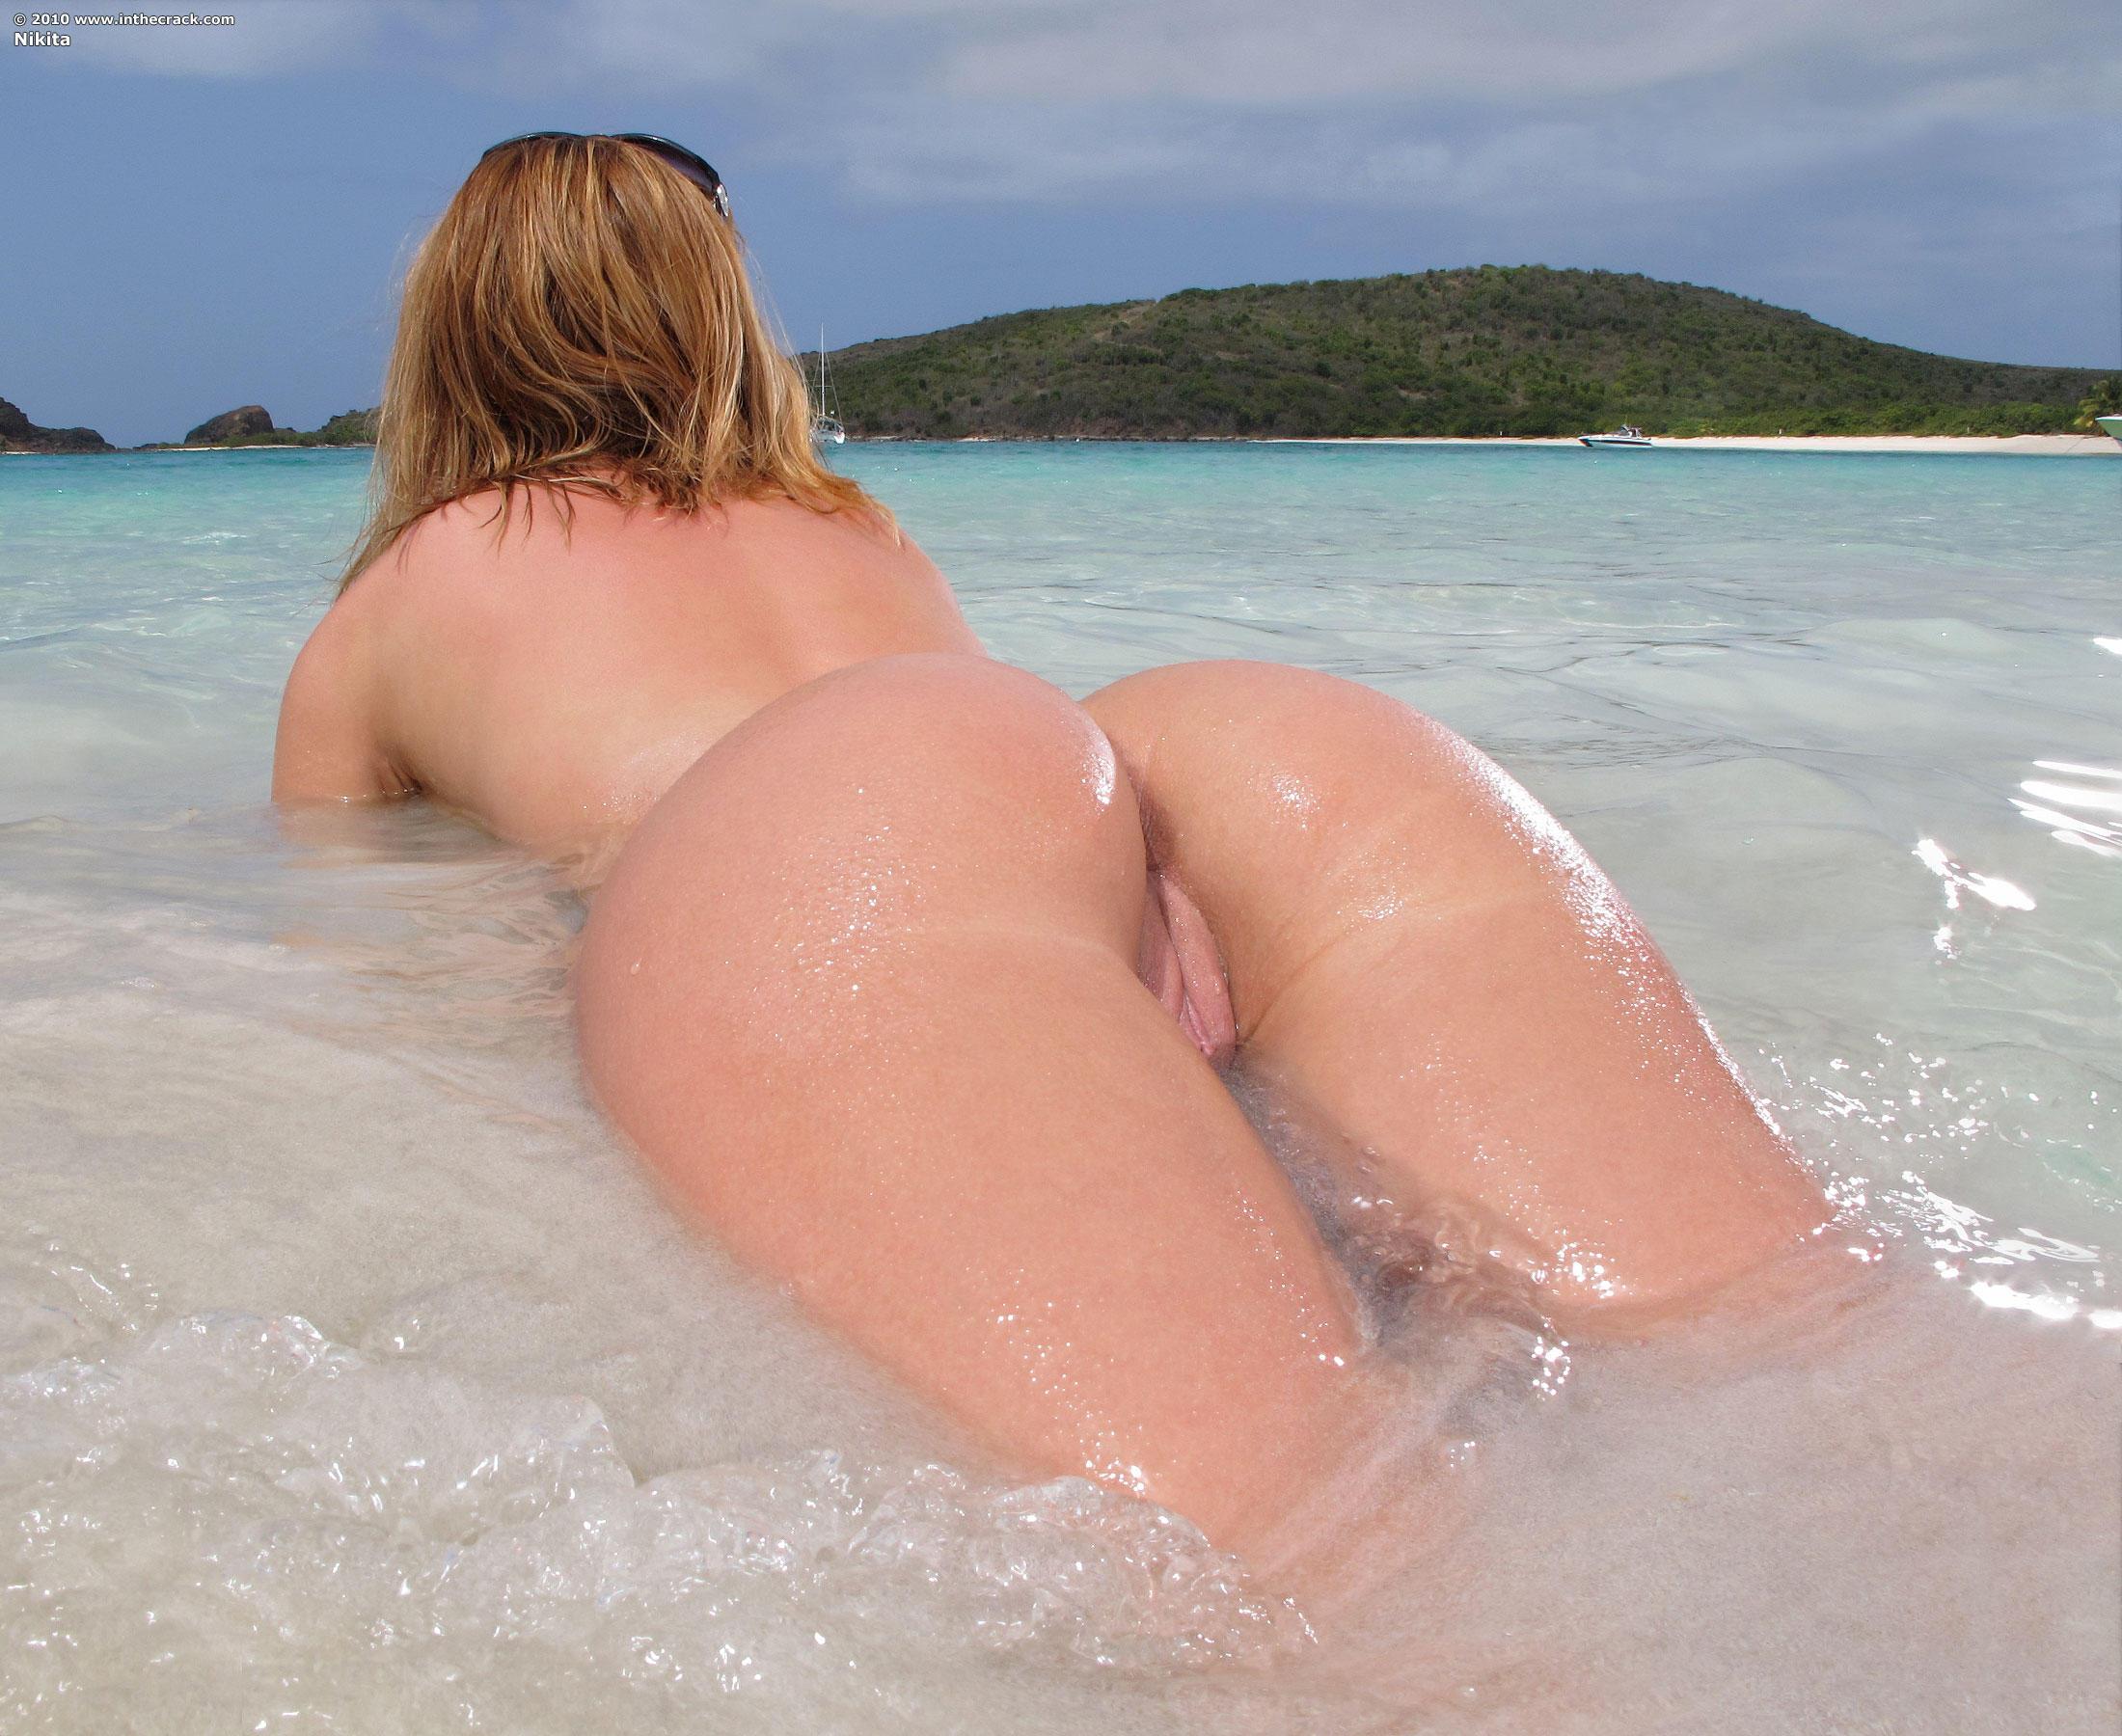 Секс жопа море фото 1 фотография